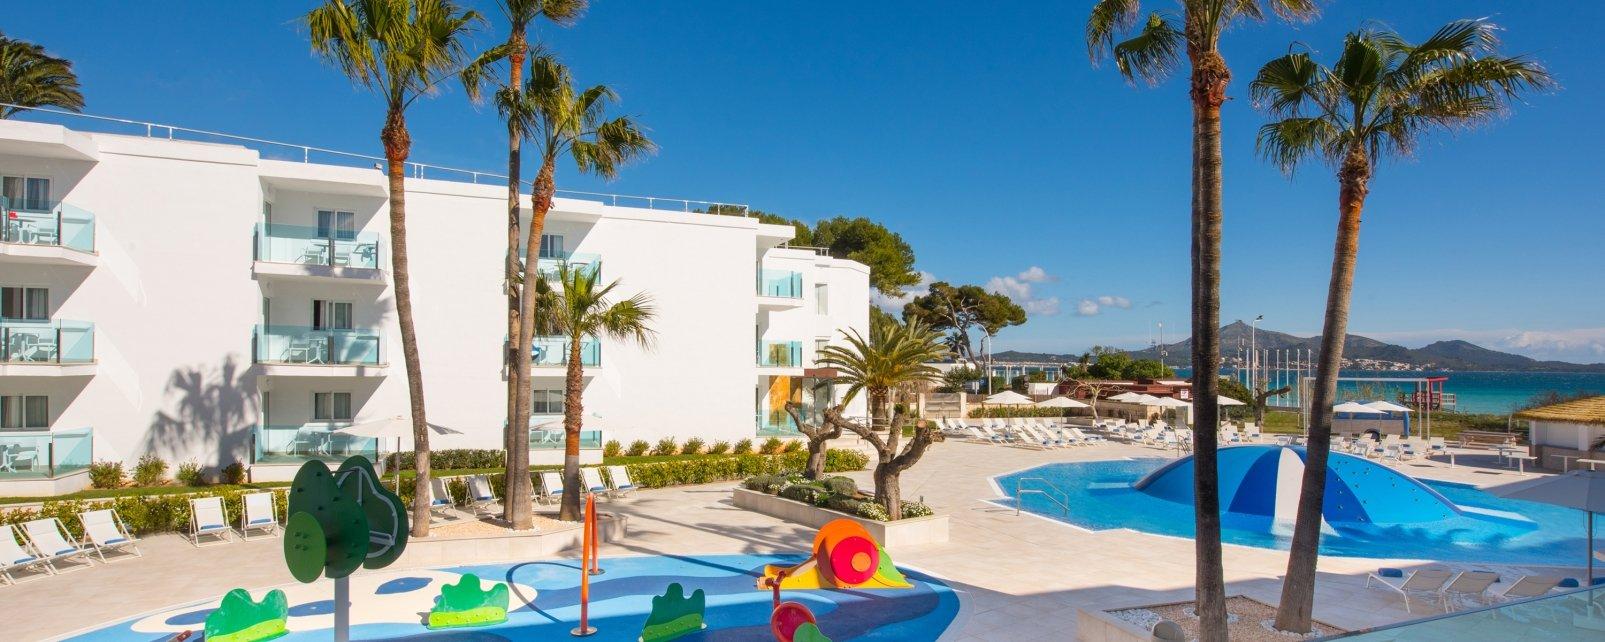 Hôtel Ibérostar Playa de Muro Village